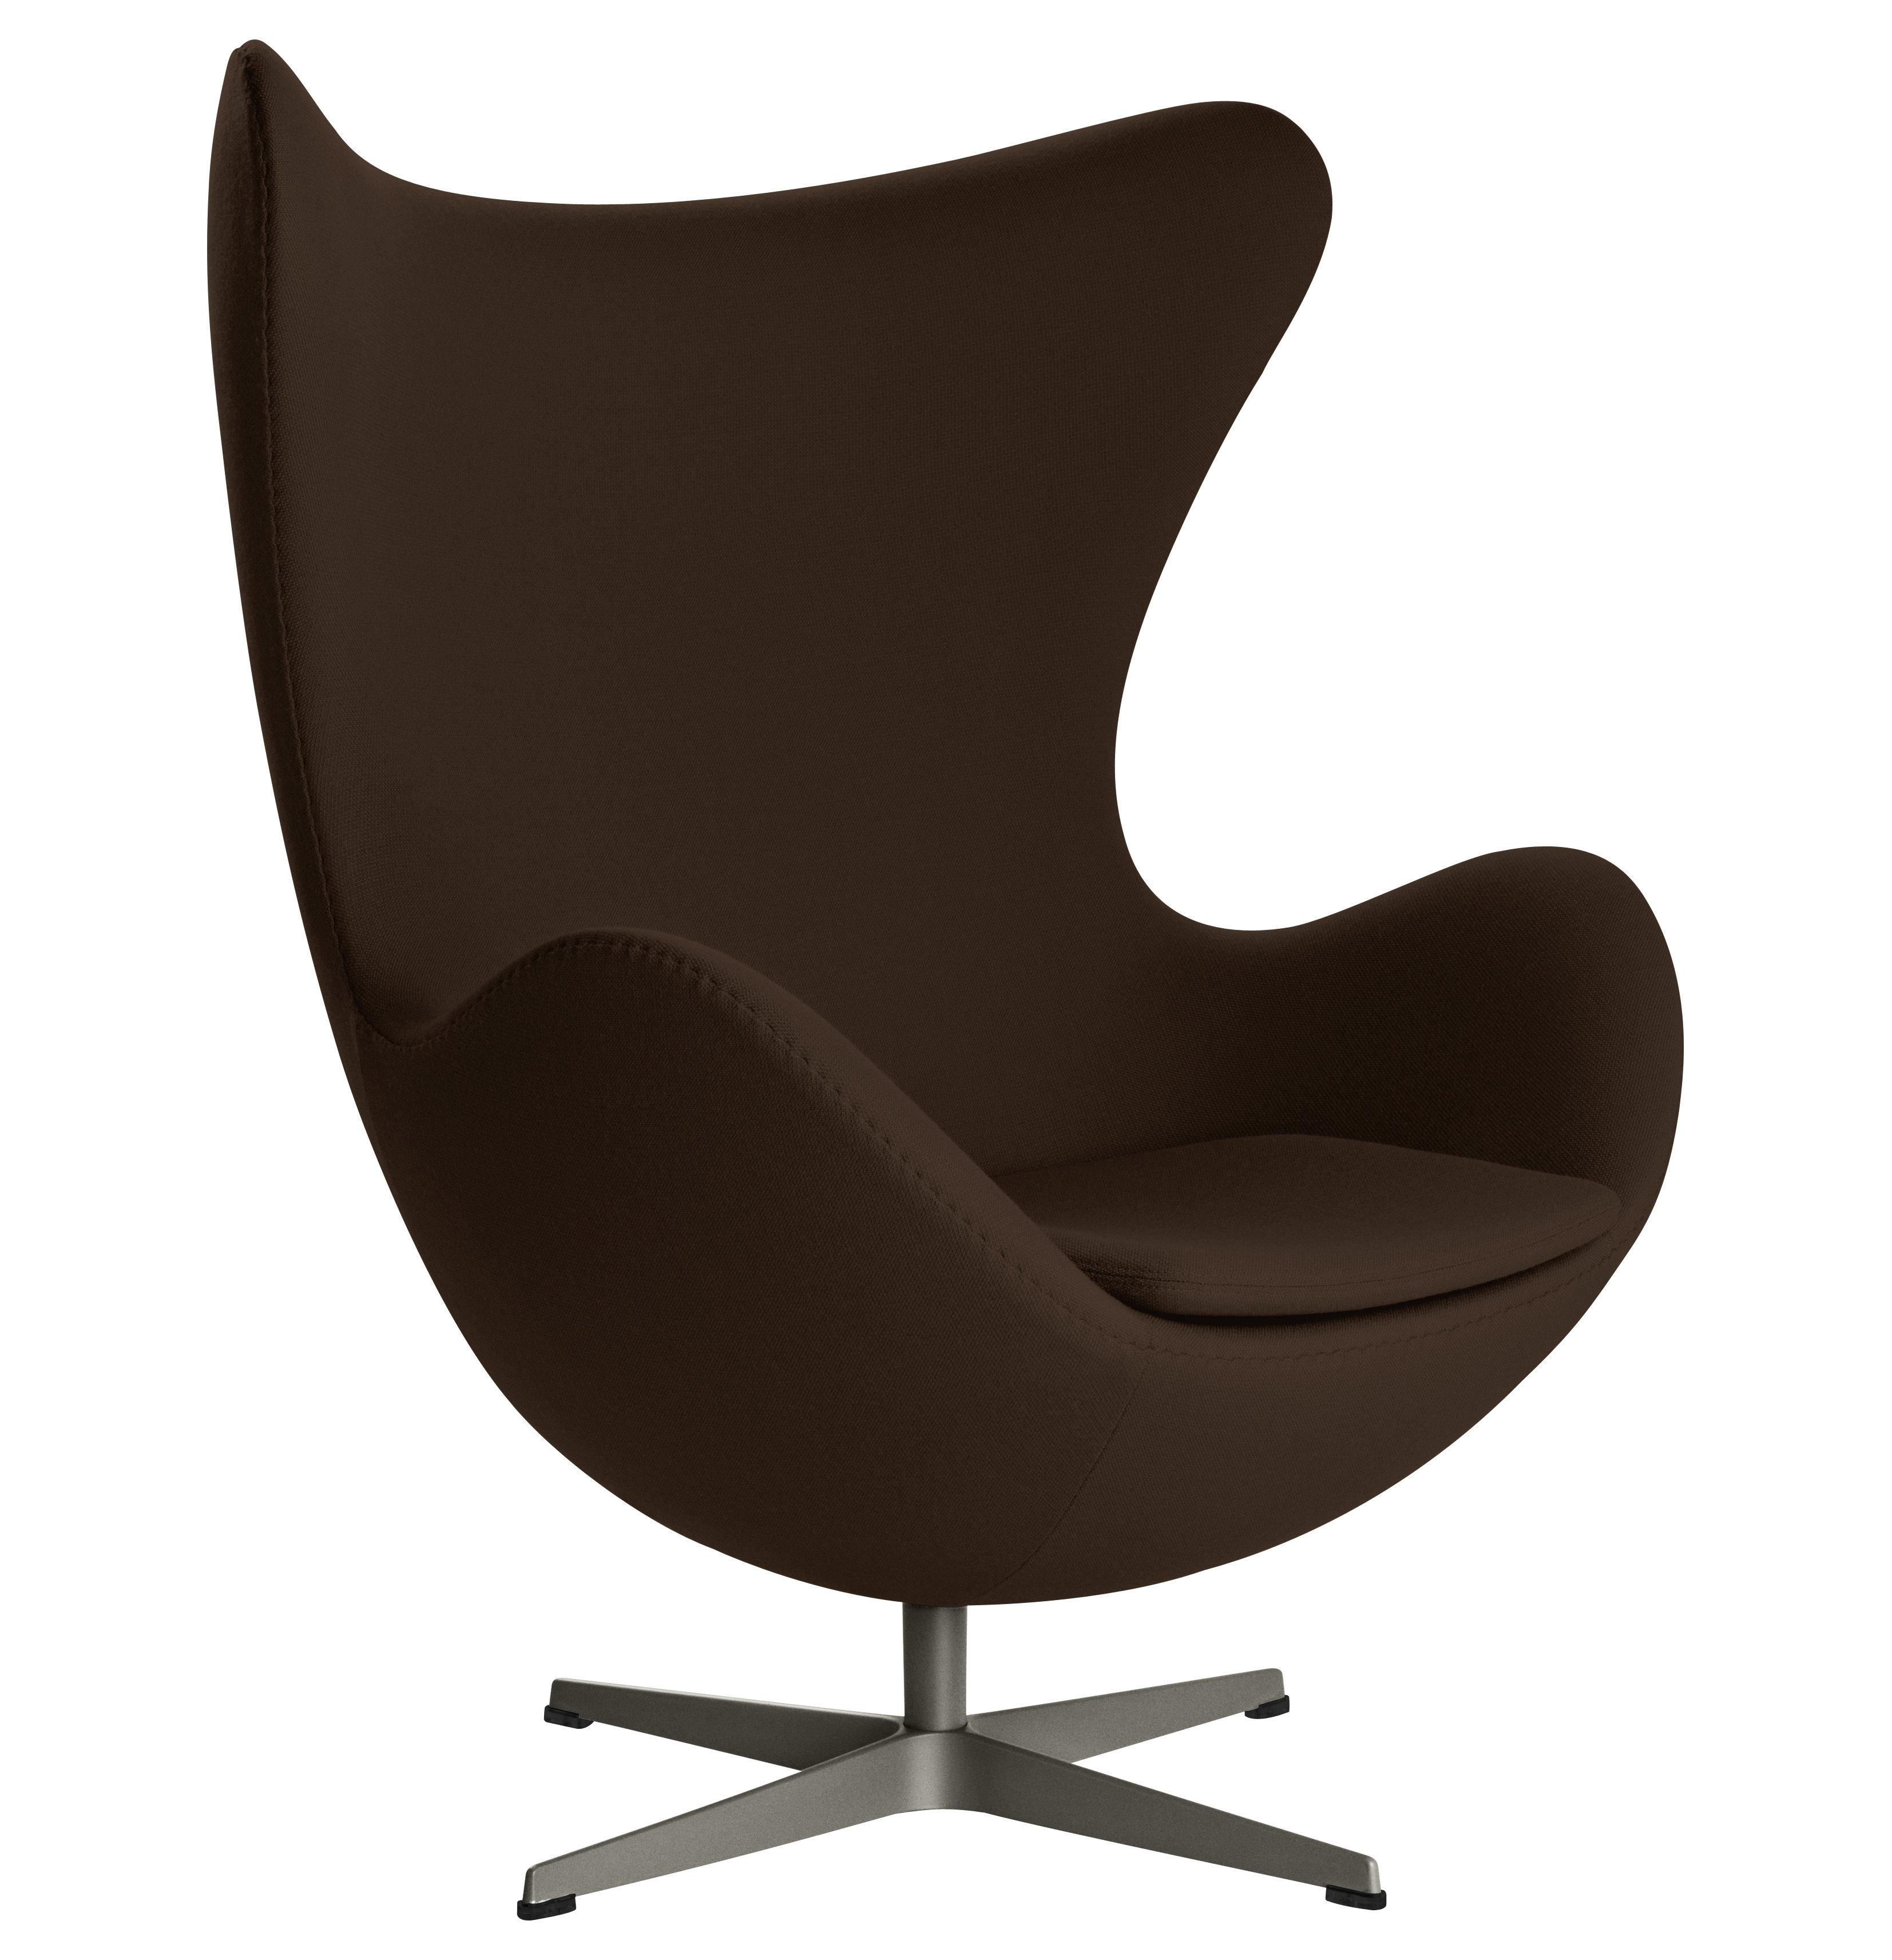 with dxf furniture models arne egg model max the jacobsen obj dwg stool chair fbx